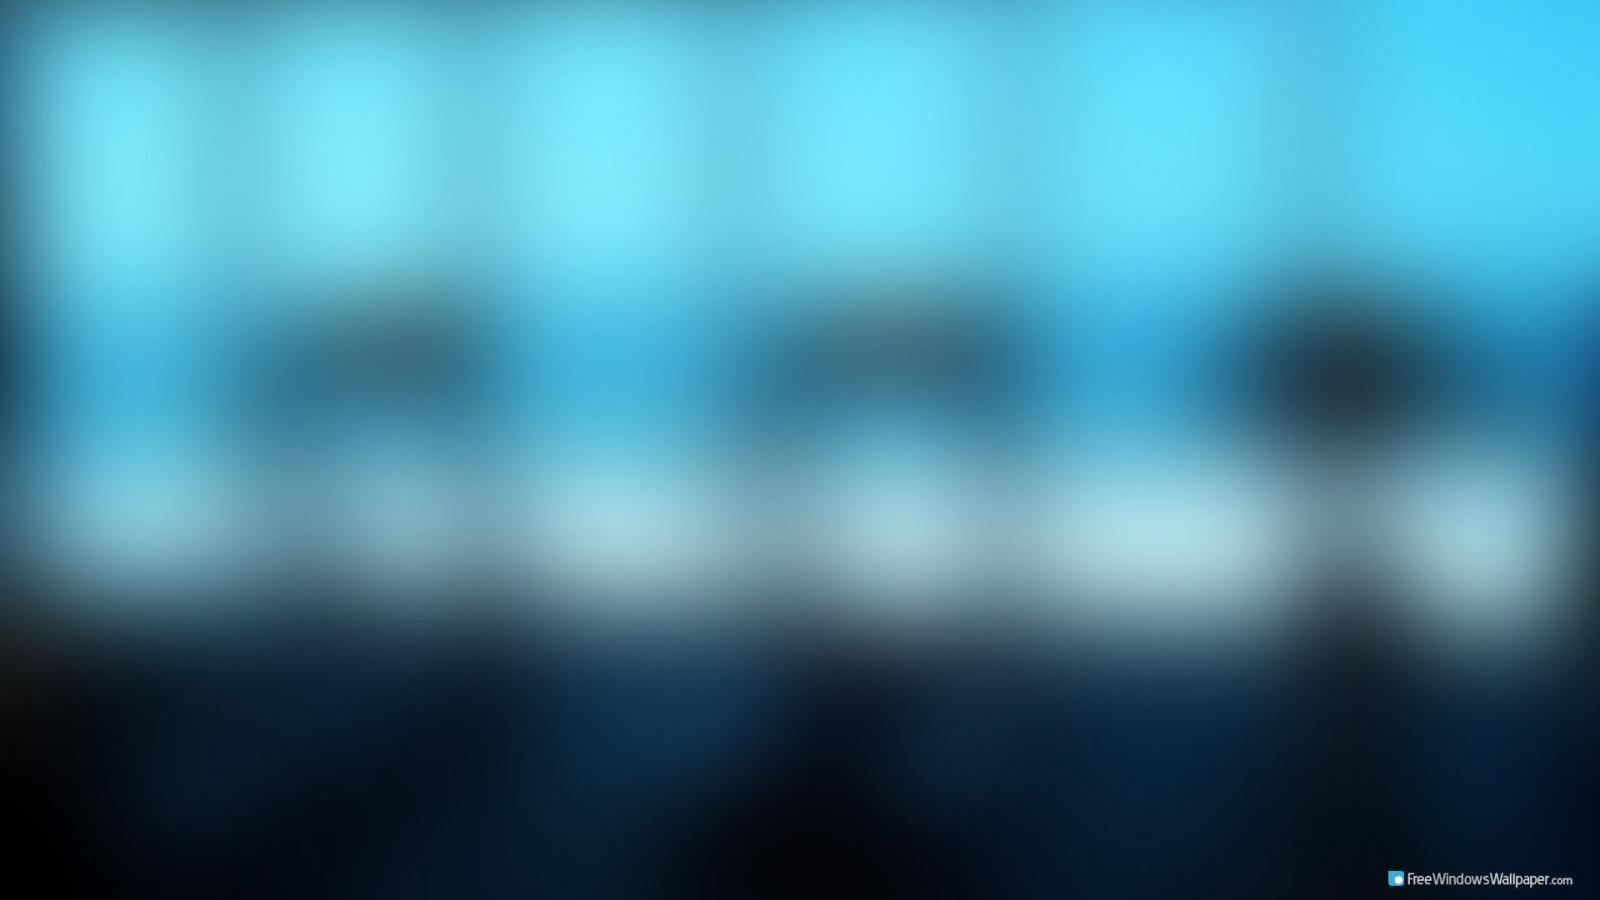 1600x900 Blue Abstract Black Abstract Desktop Wallpaper 1600x900